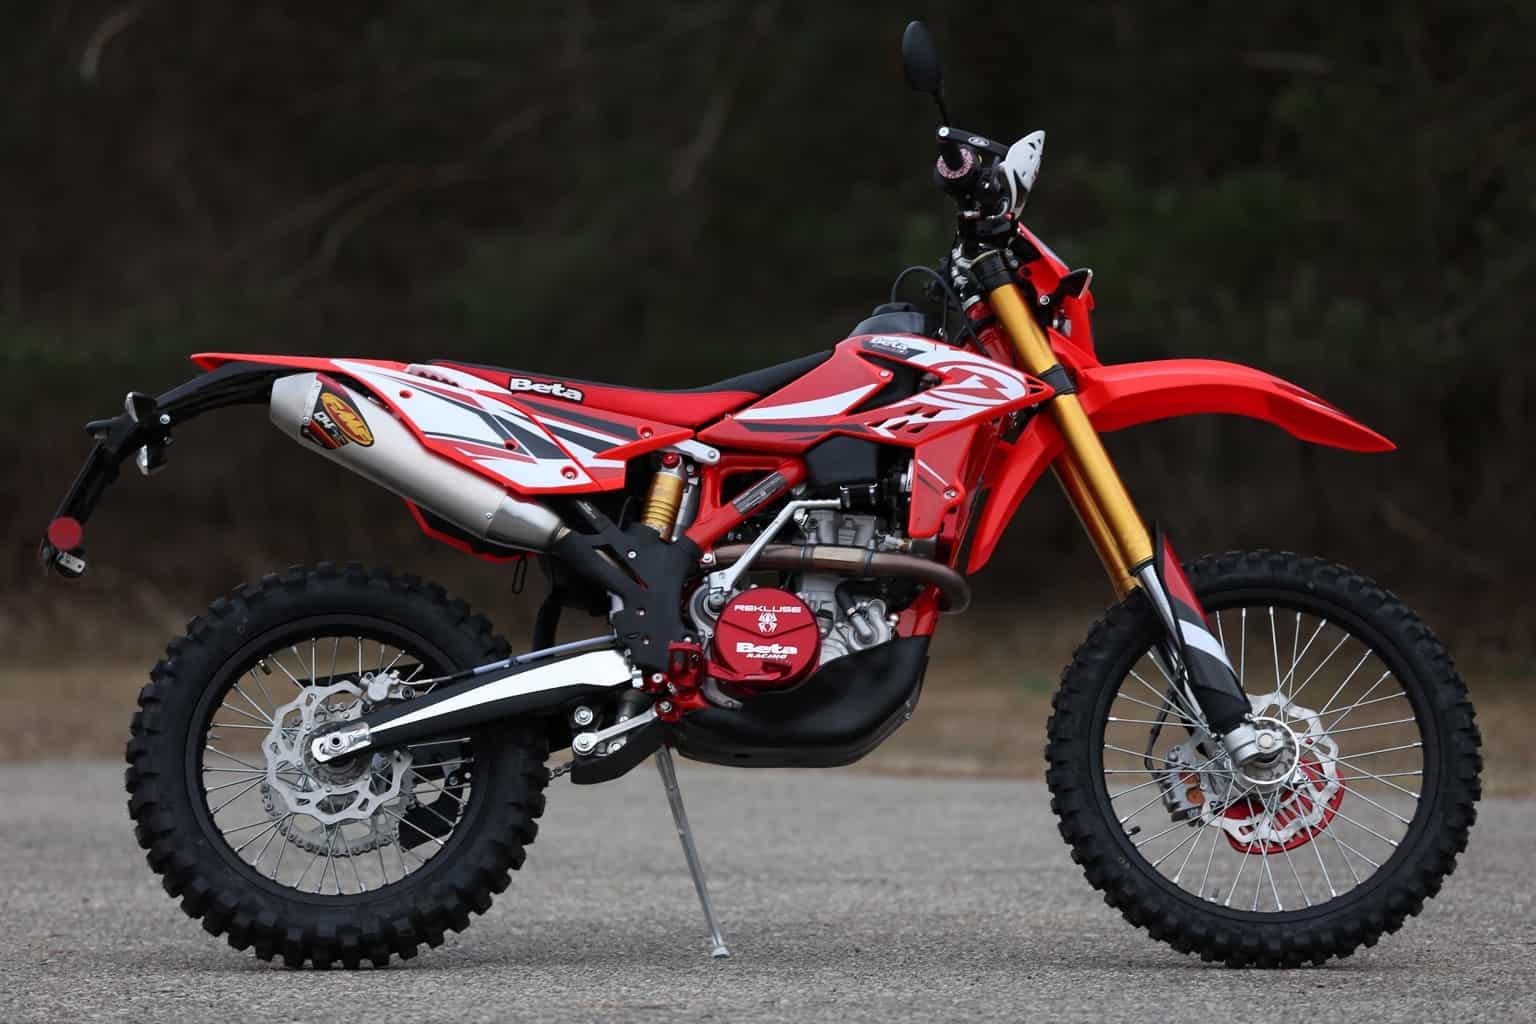 Beta500RR-S – dual sport motorcycle